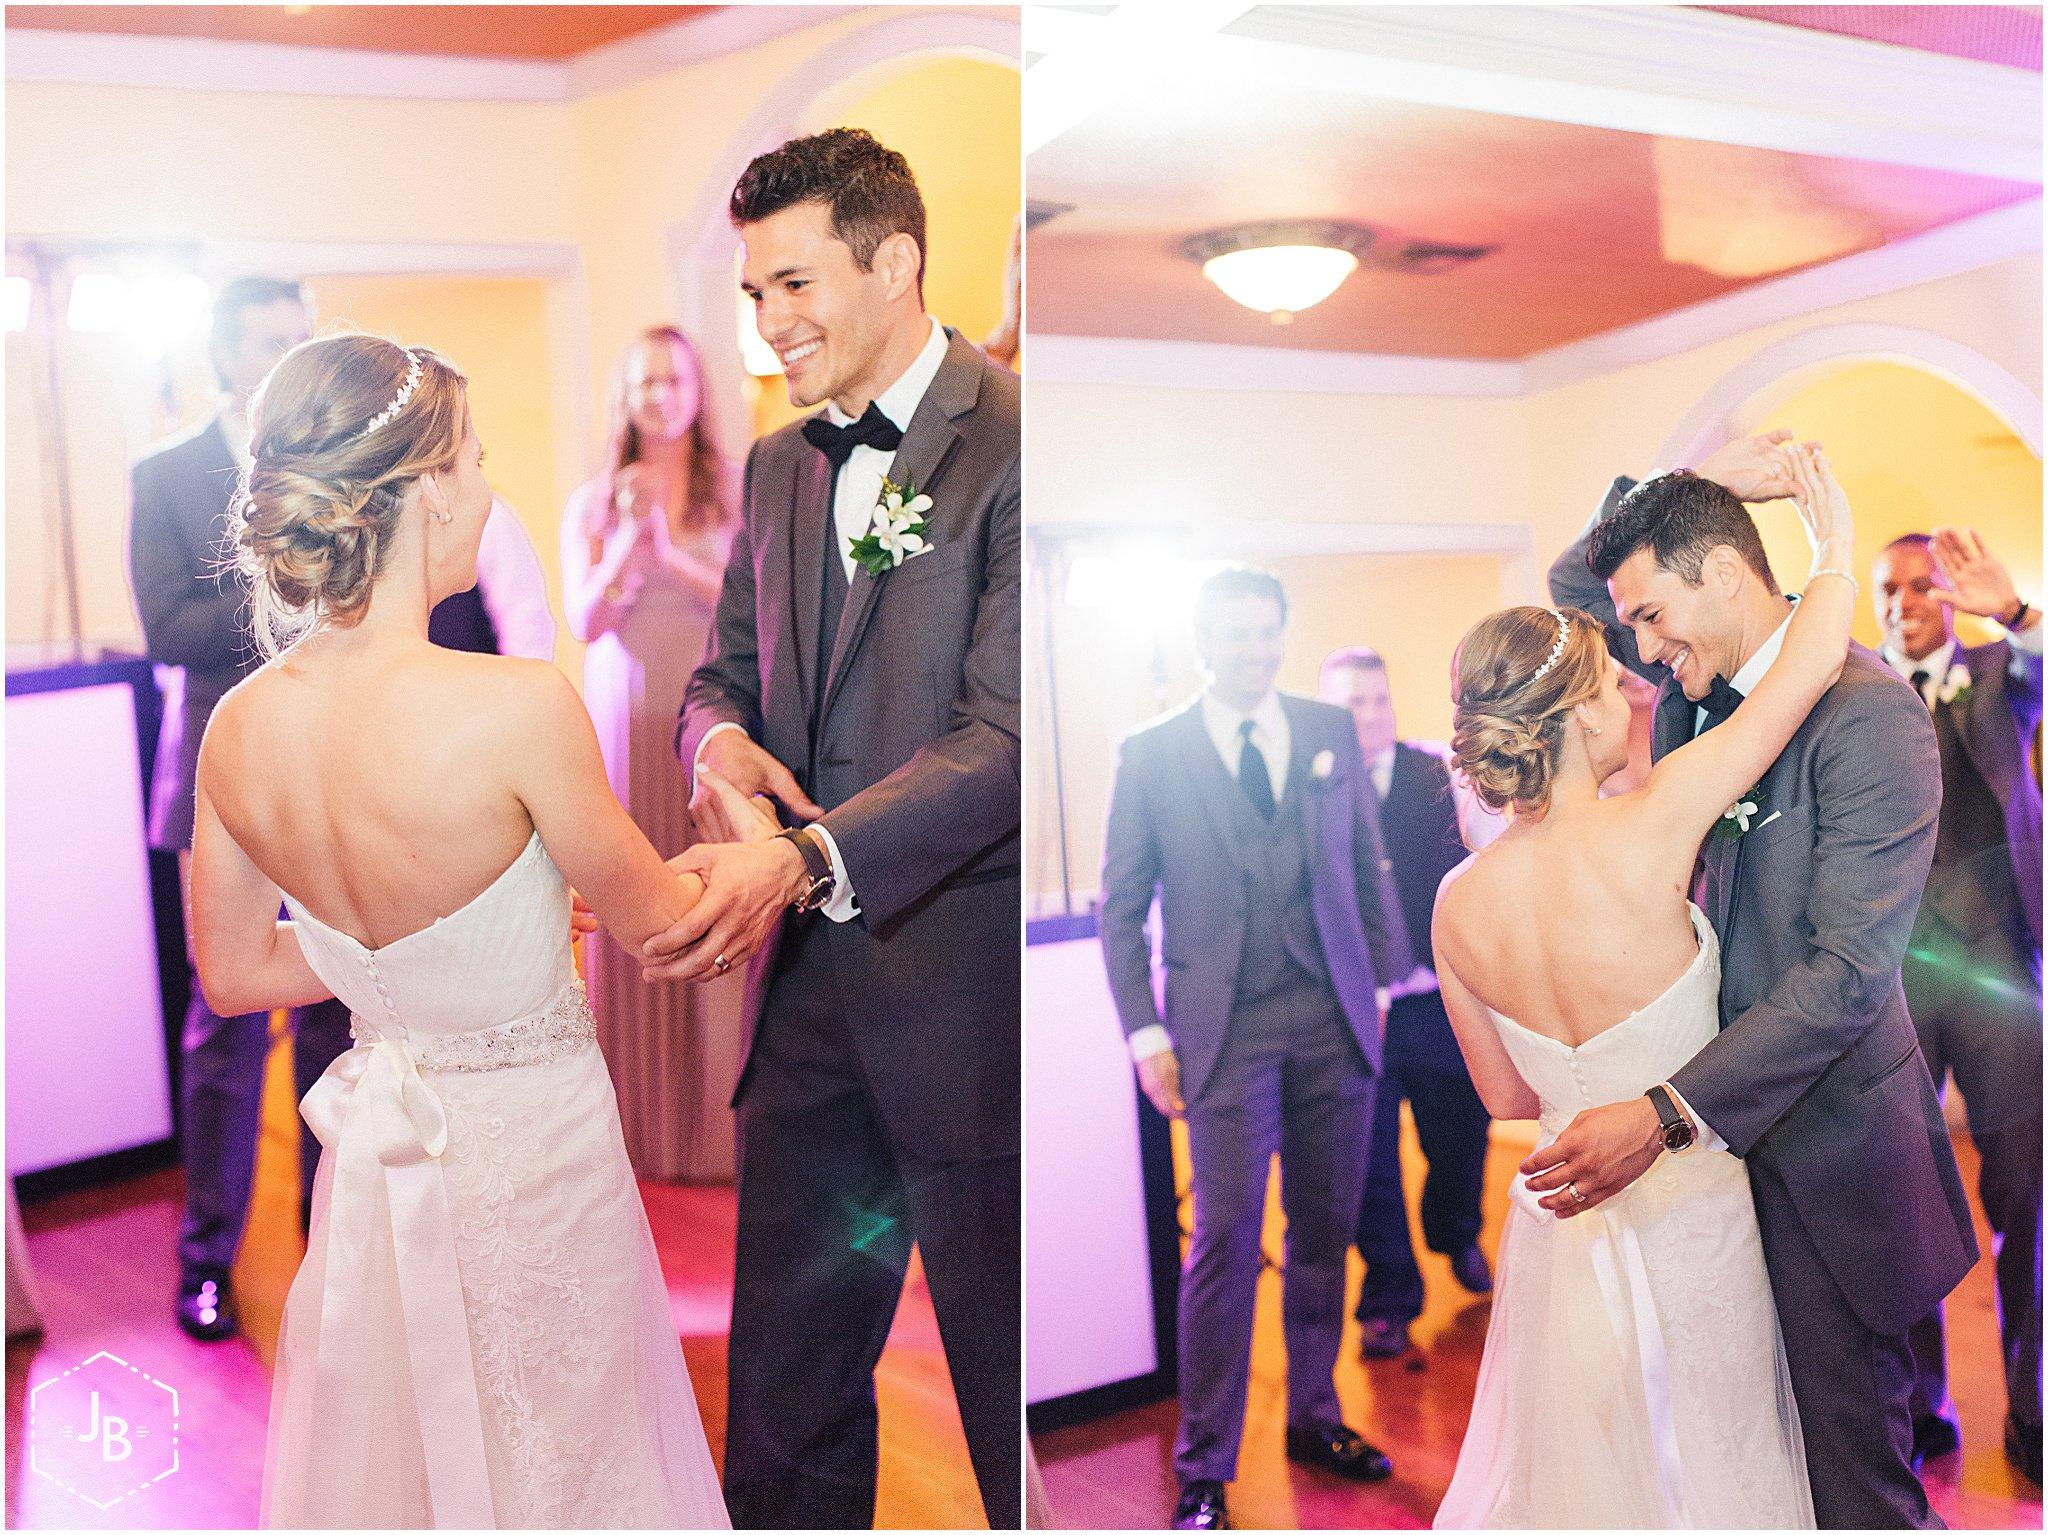 WeddingandEngagementFloridaPhotographer_0388.jpg